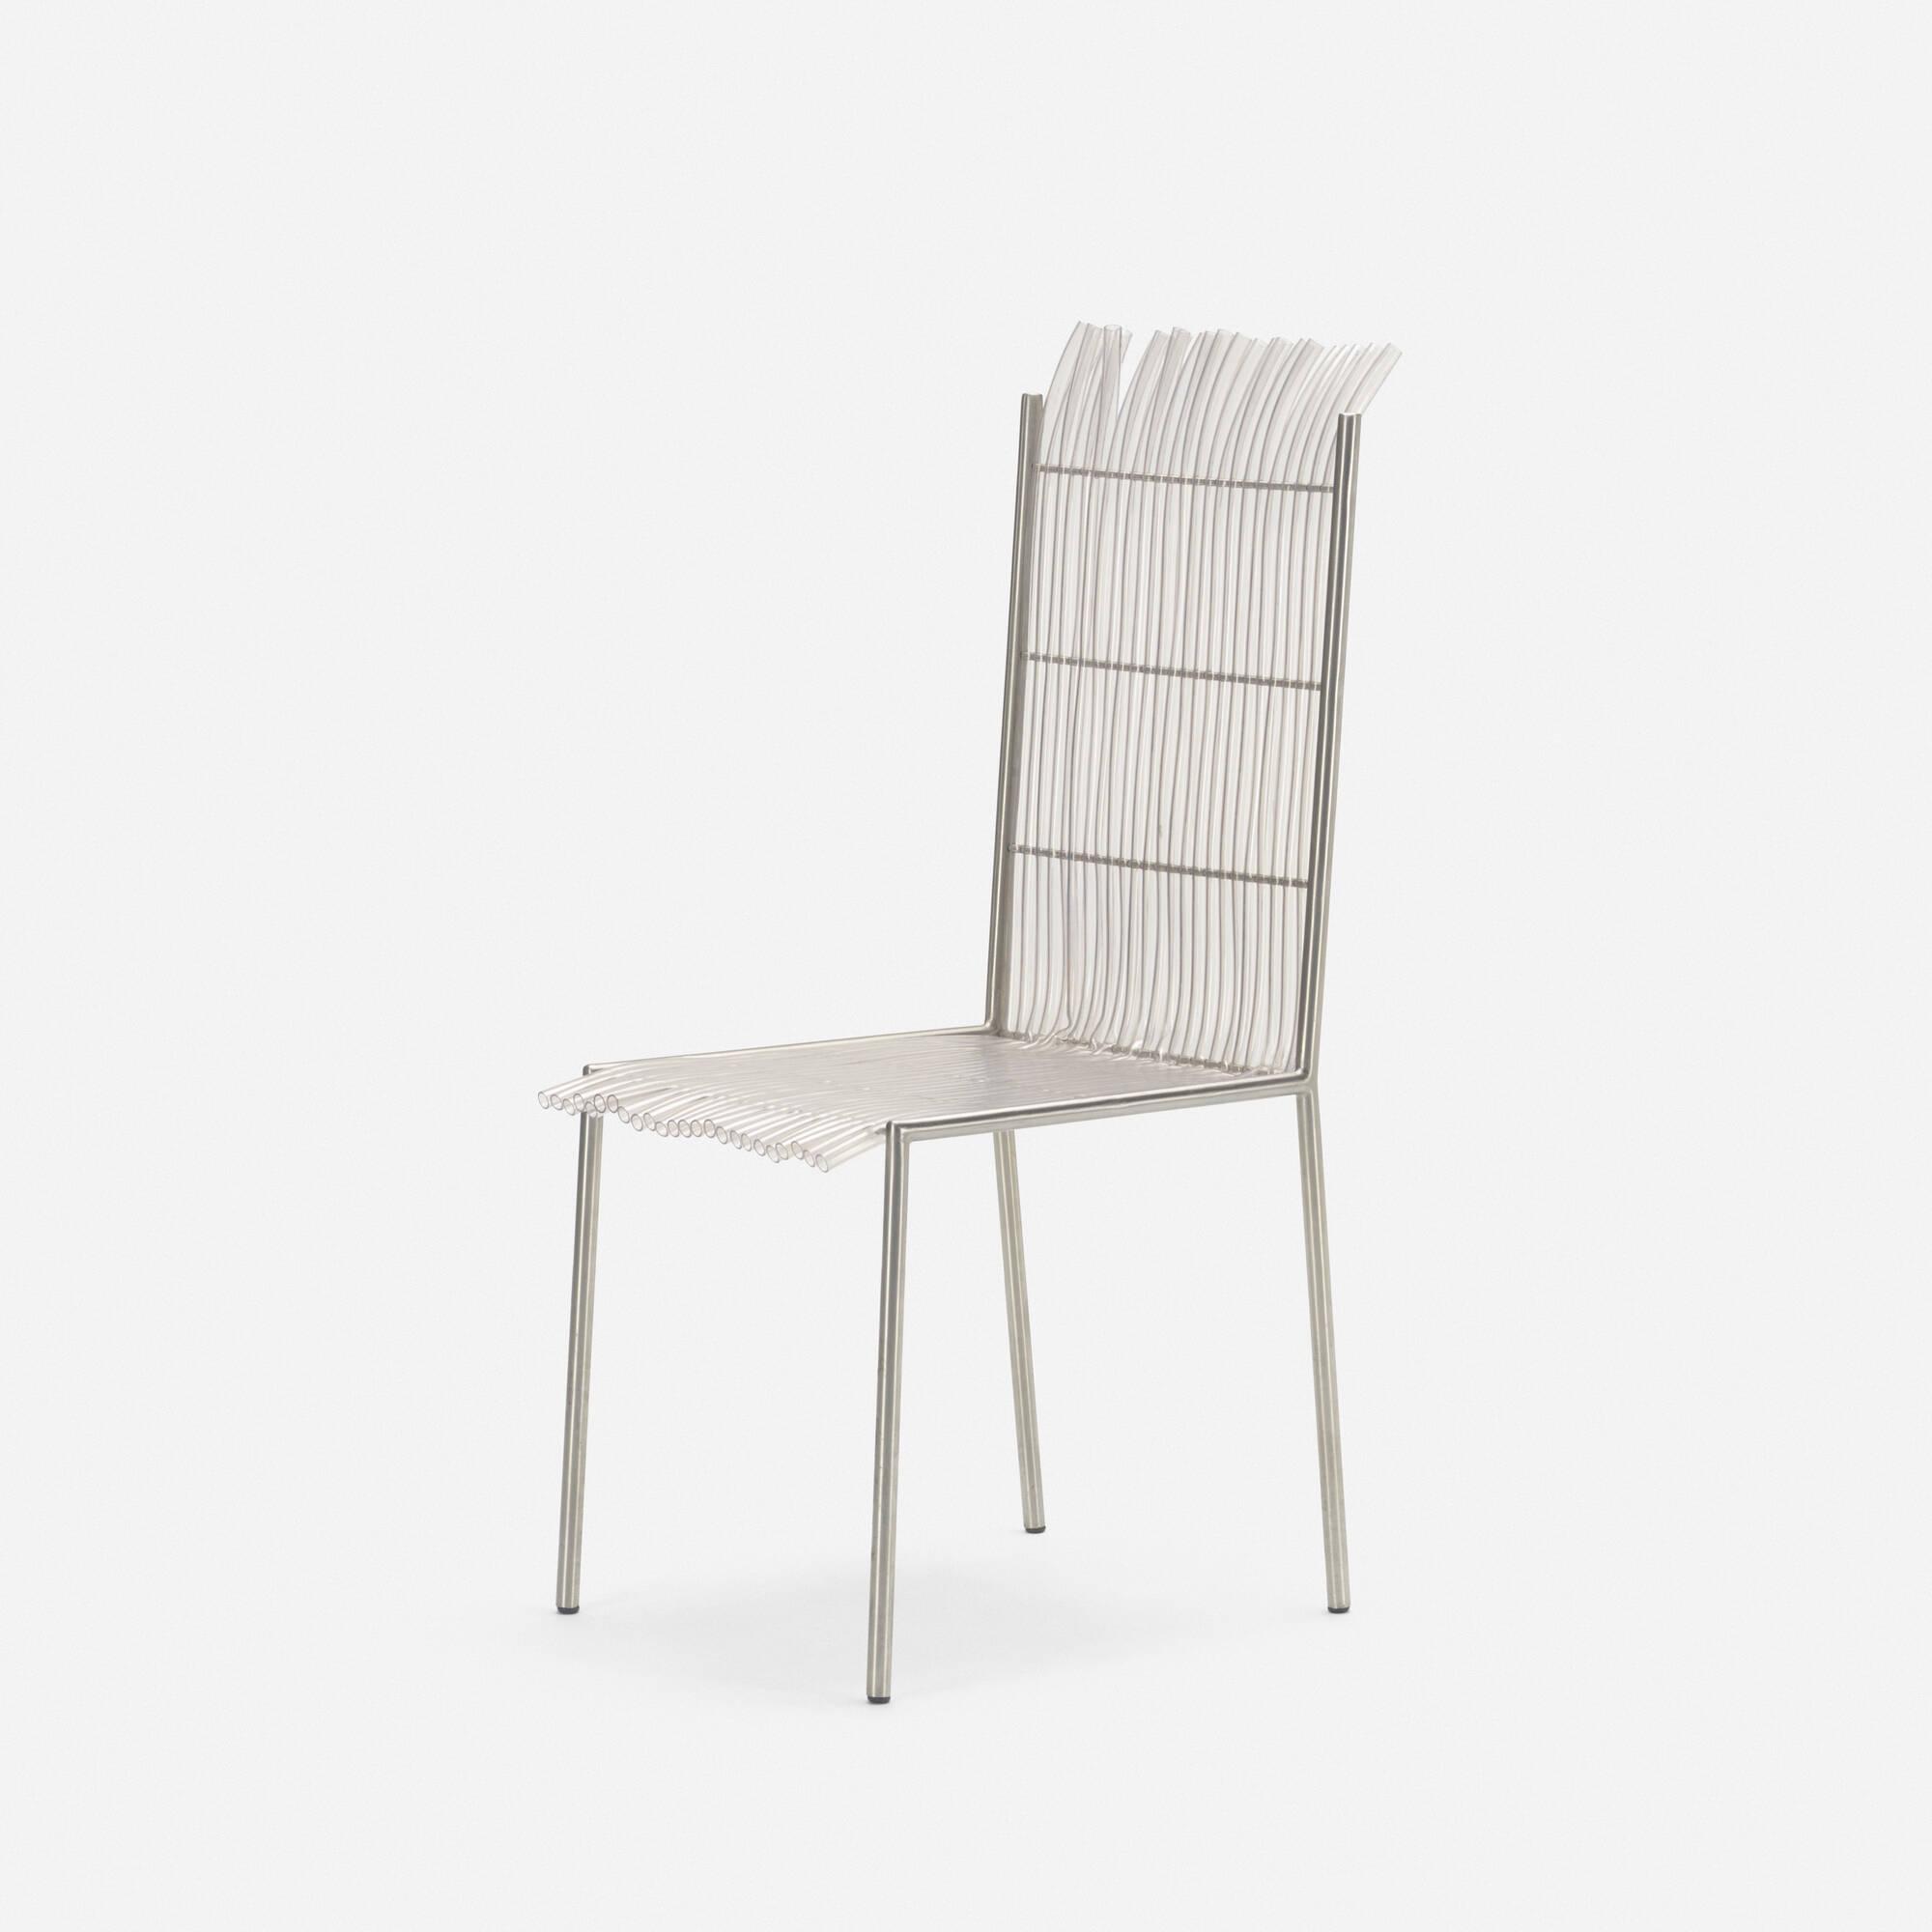 403: Fernando and Humberto Campana / Jardim chair (1 of 4)